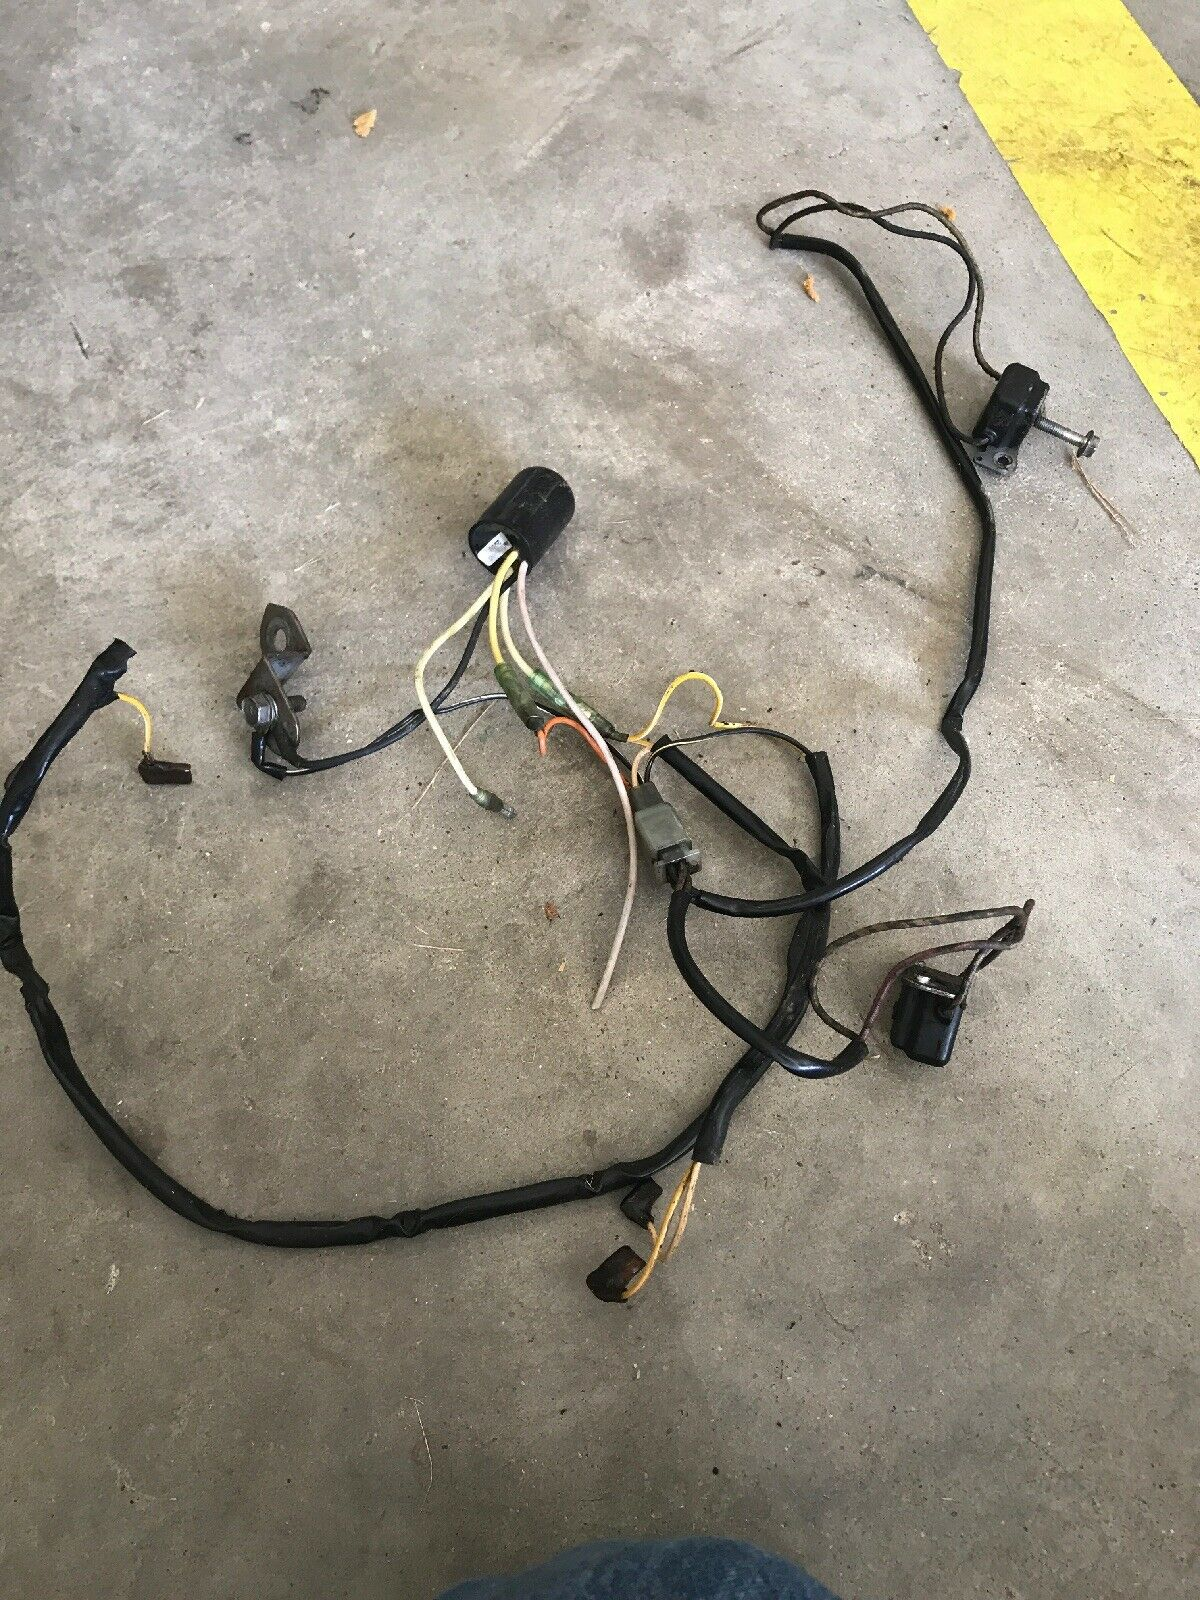 John Deere 425 Wiring Harness - Wiring Diagram 500 on john deere l120 wiring diagram, john deere engine wiring diagram, john deere 170 pto wiring, muncie hydraulic electric shift wiring, john deere l111 wiring diagram, john deere mower wiring diagram, john deere 210 pto wiring, john deere 318 pto wiring, john deere radio wiring diagram, john deere alternator wiring diagram, john deere tractor wiring, john deere 50 wiring diagram, john deere 345 pto wiring, john deere 160 pto wiring, john deere 650 wiring diagram, john 10 10 switch wiring diagram, john deere 425 engine diagrams, john deere 316 pto wiring,